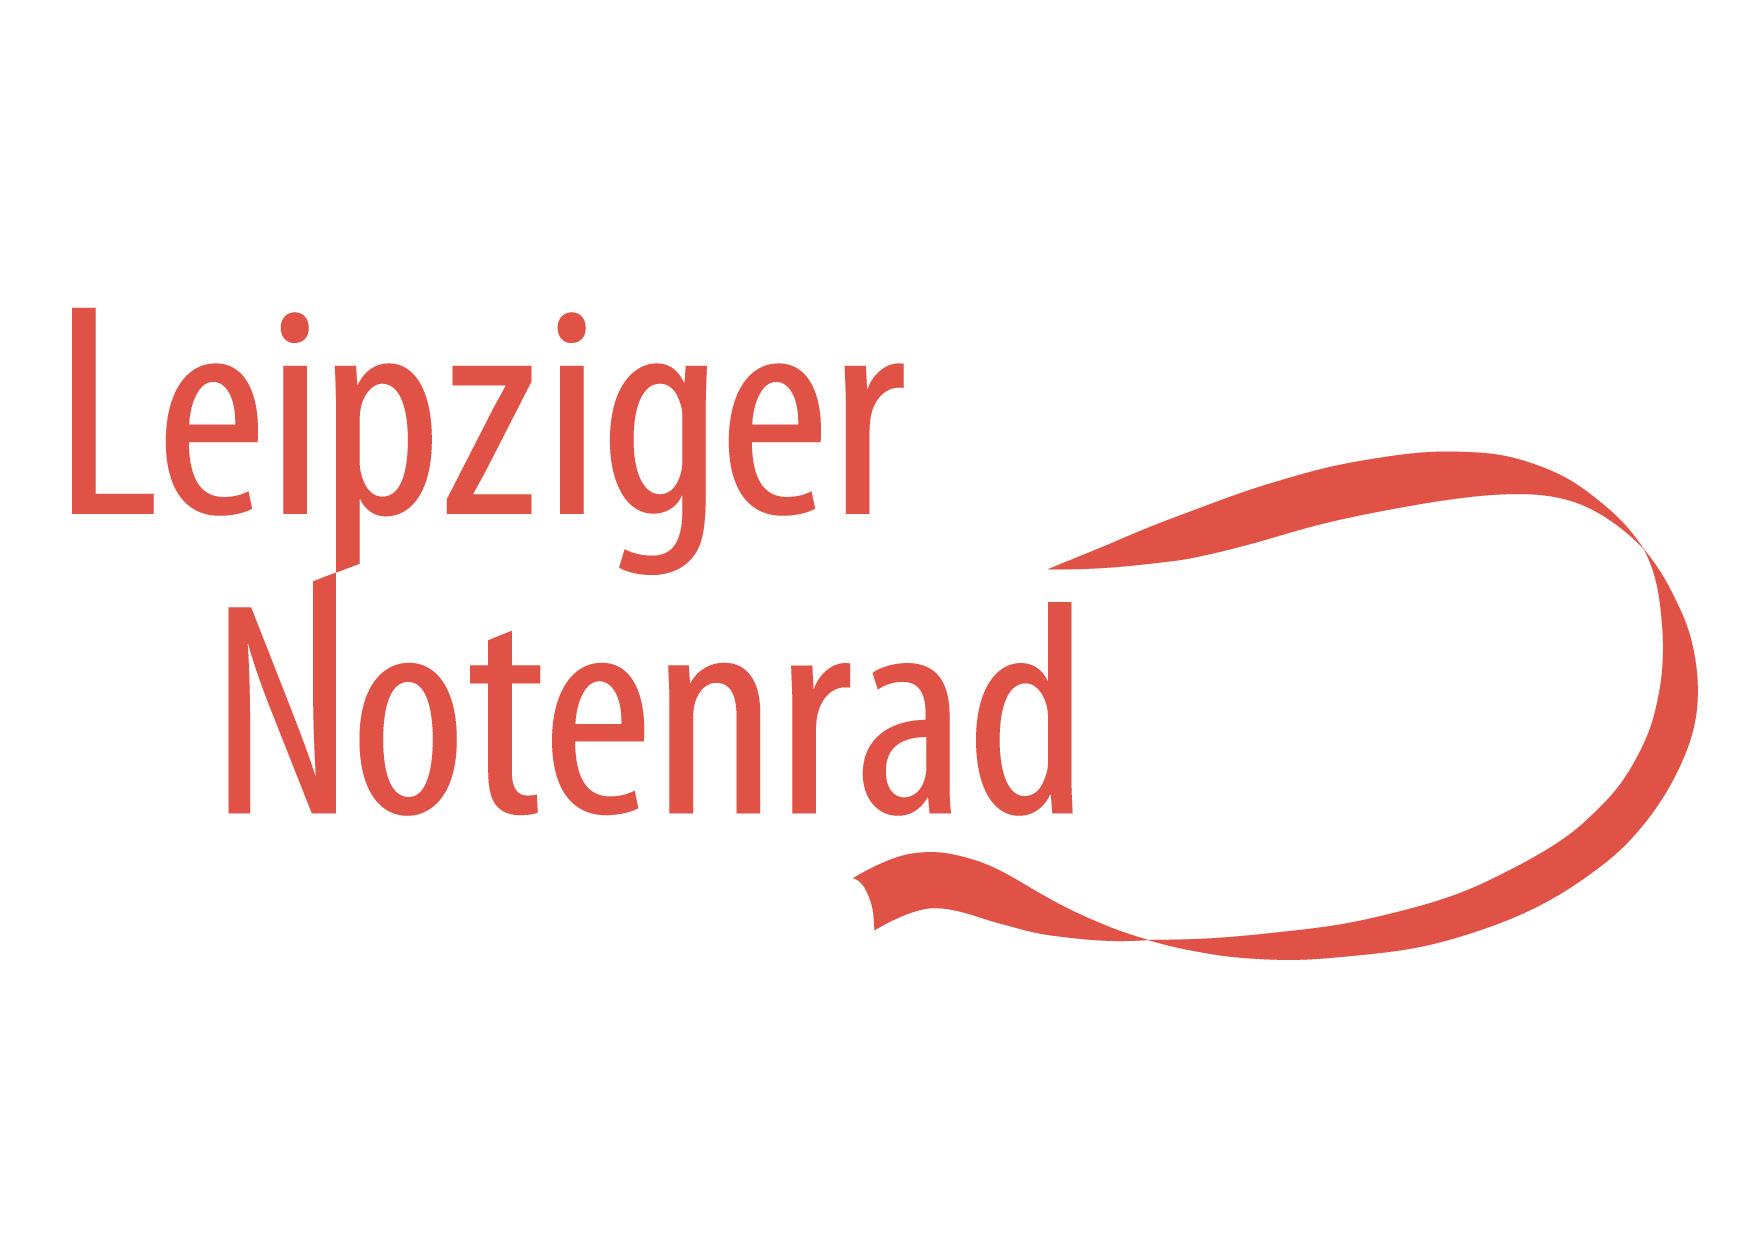 Leipziger Notenrad